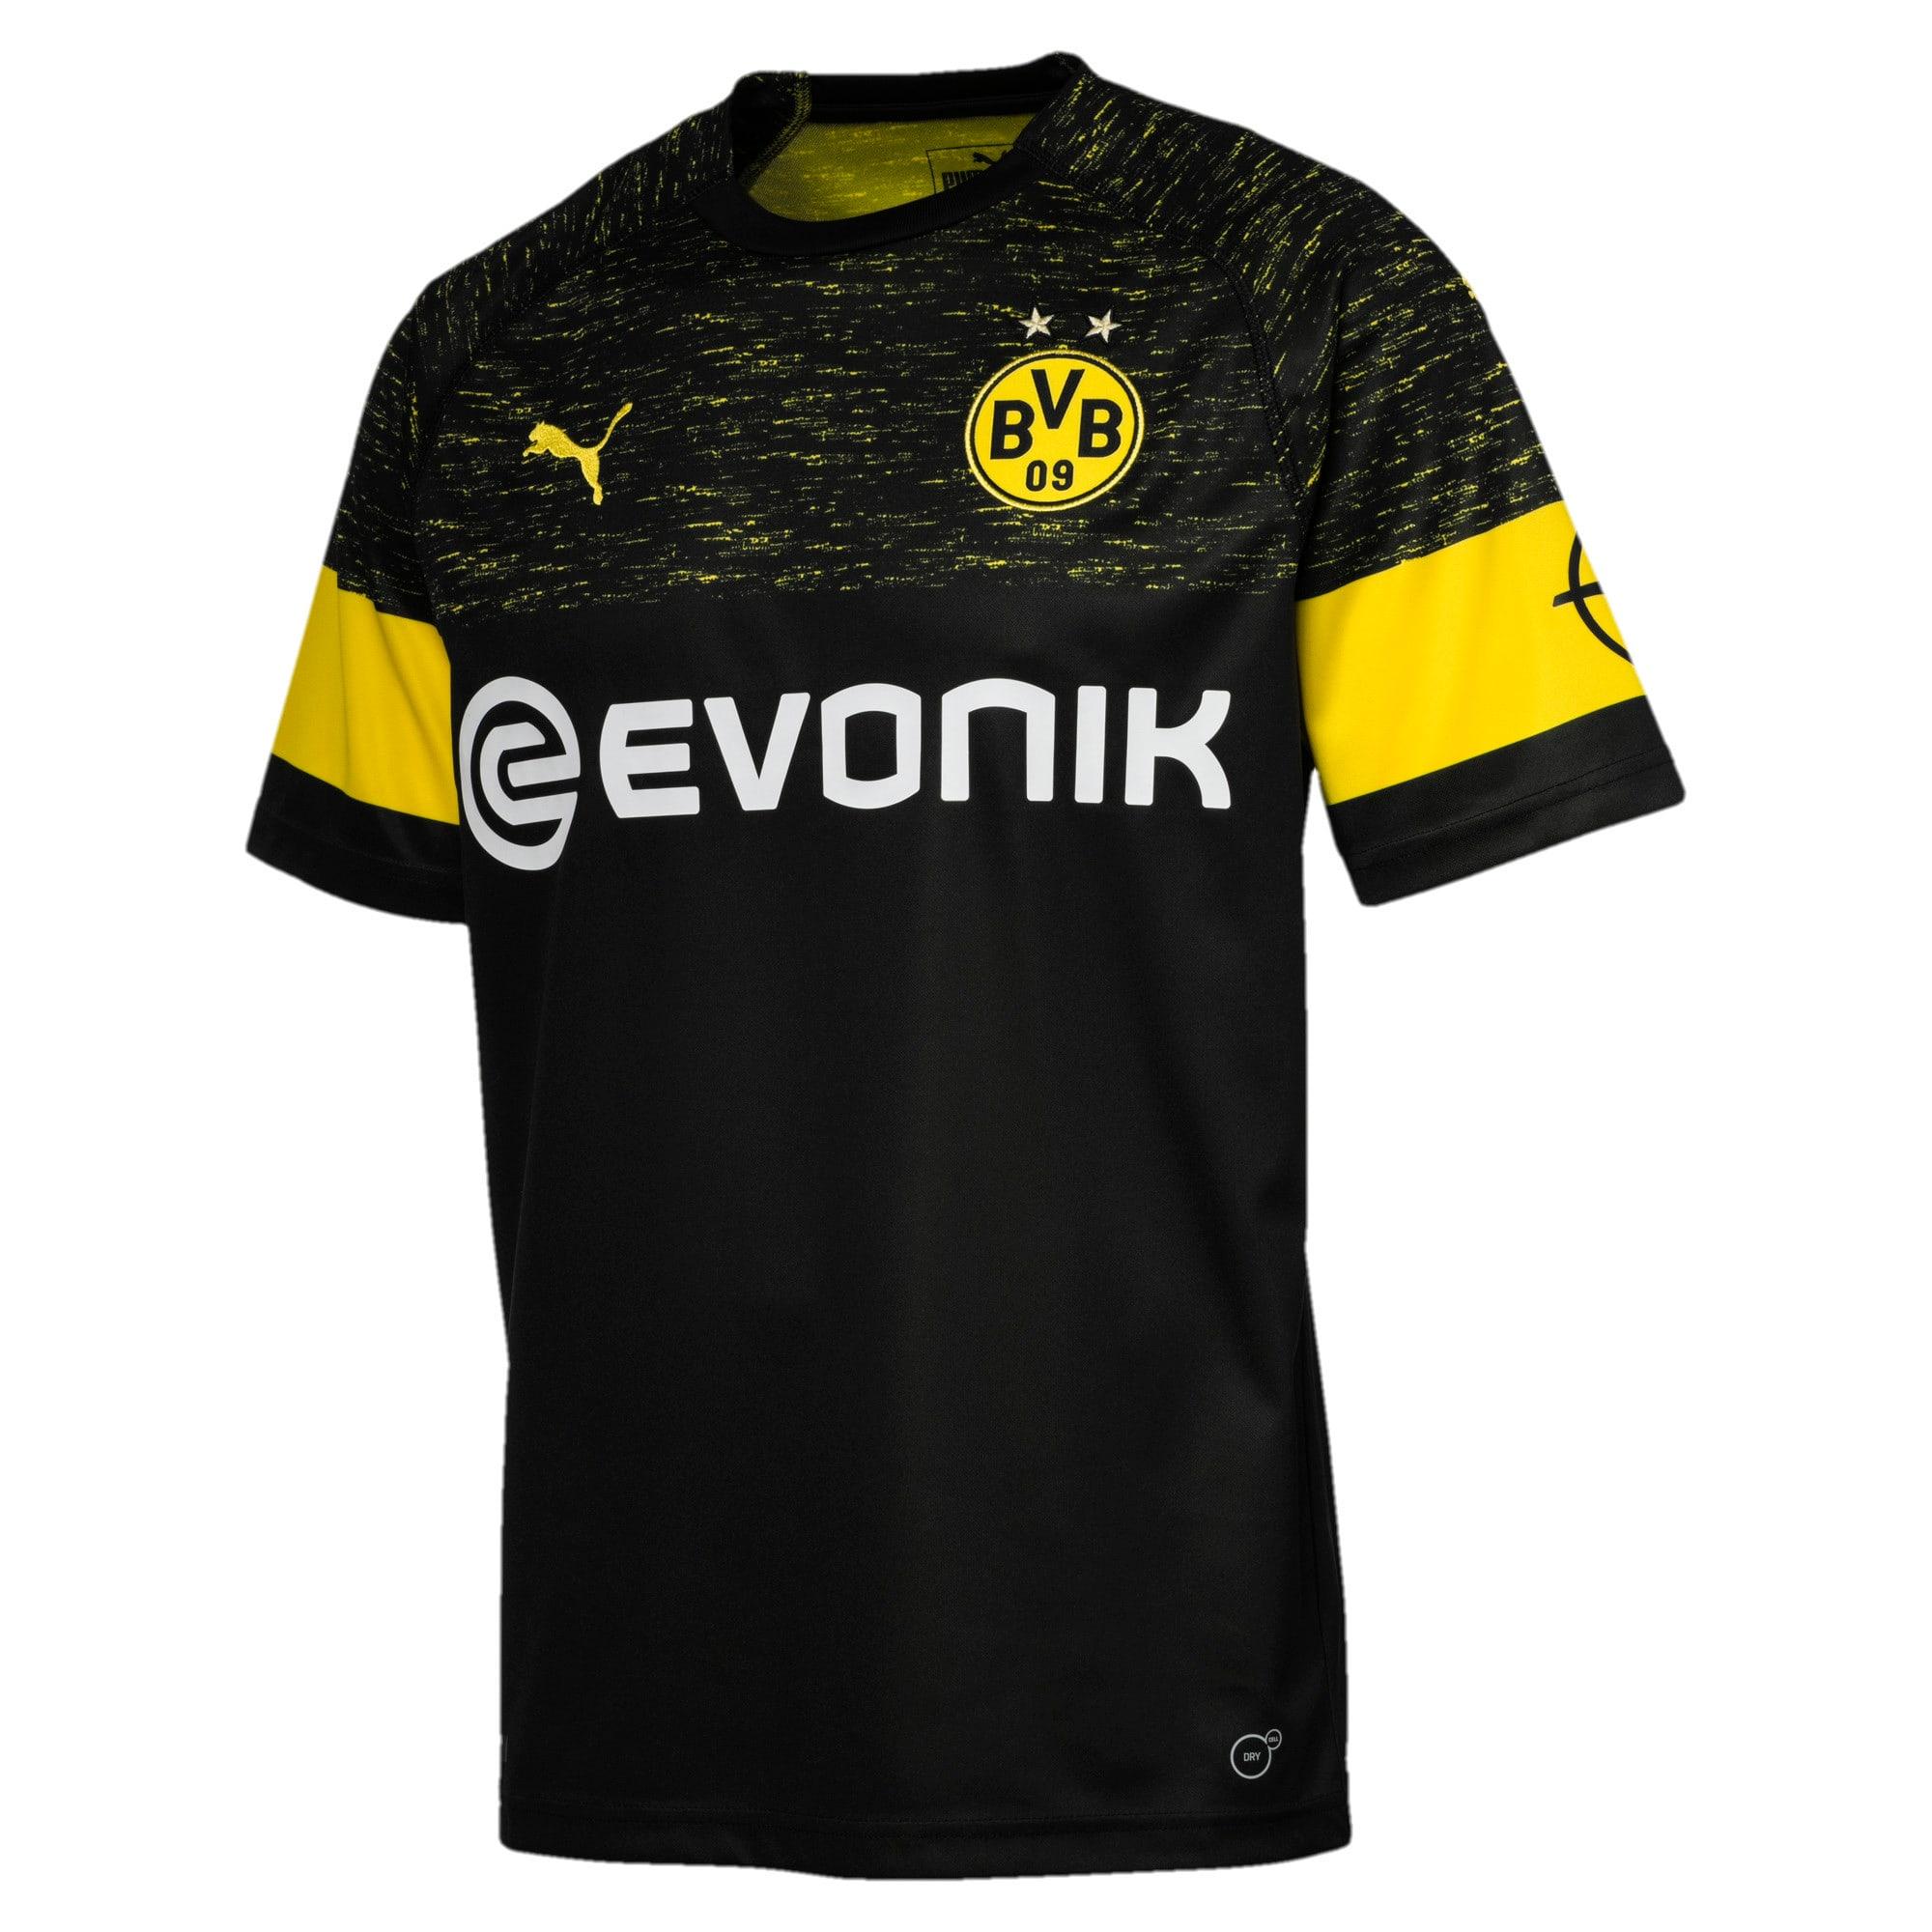 Thumbnail 2 of BVB Men's Replica Away Shirt, Puma Black, medium